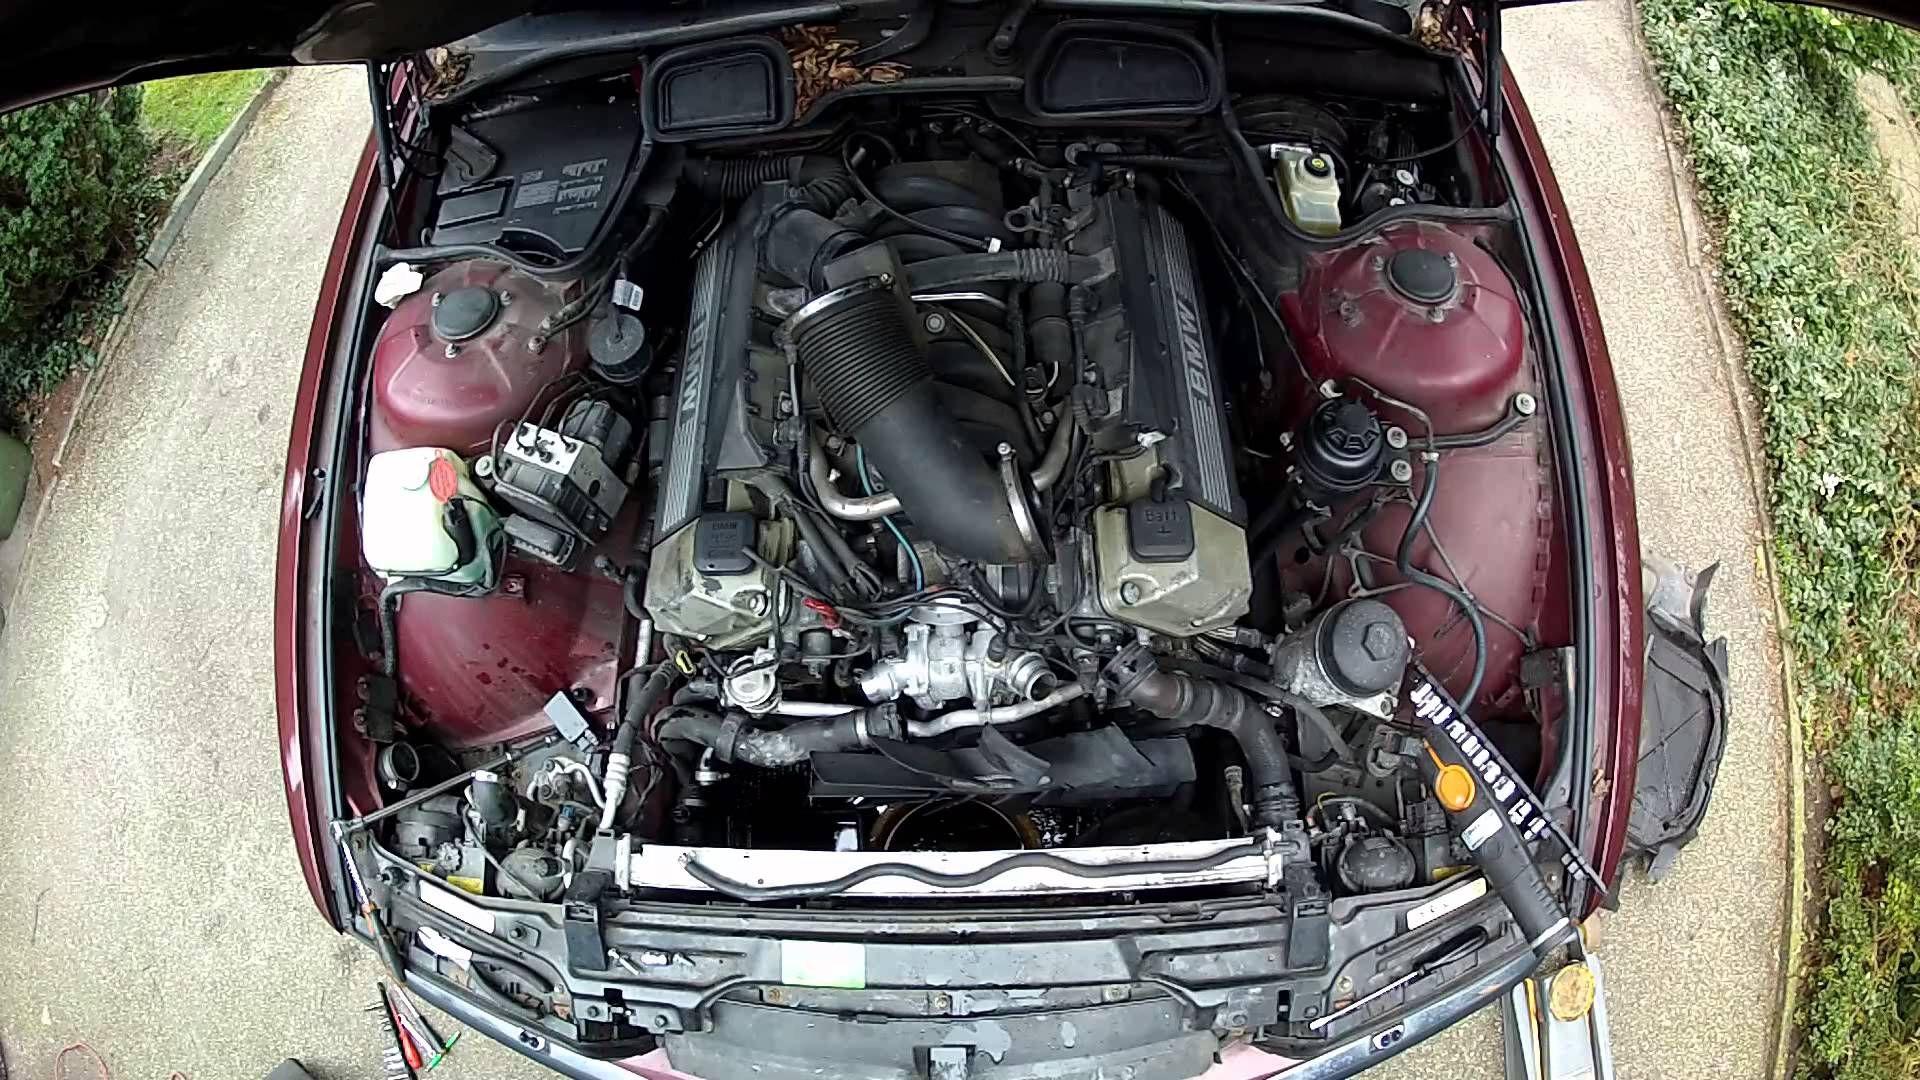 Bmw M62 Tu E38 And E39 Alternator Change Part 1 Bmw M62 Bmw Alternator